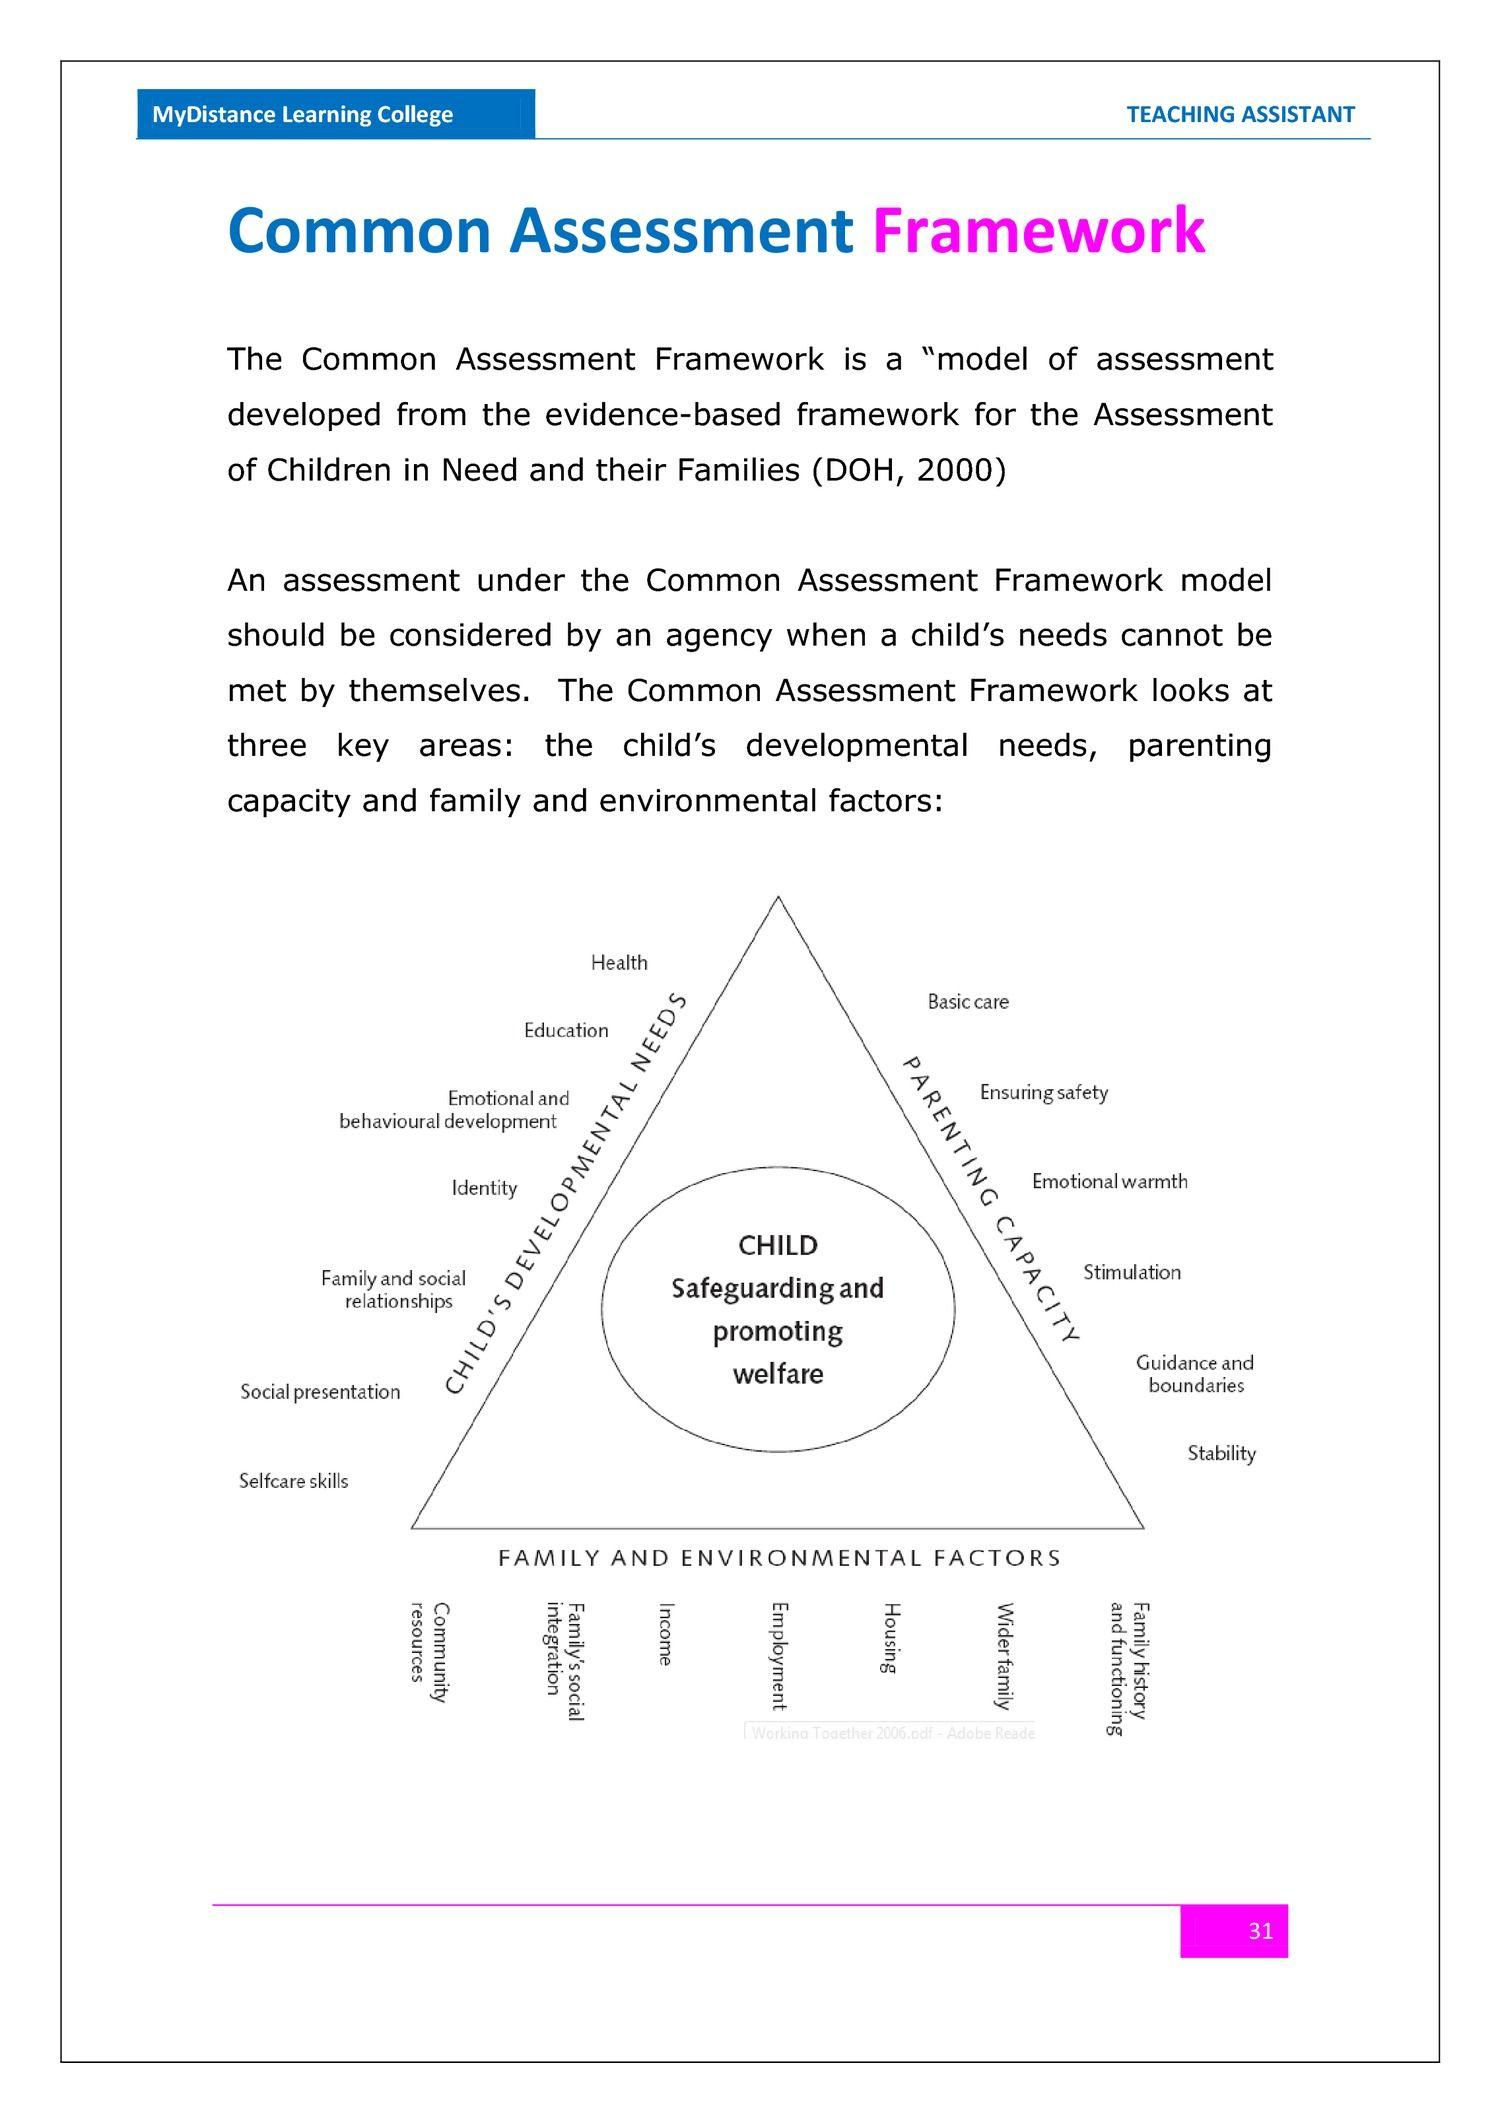 best ideas about career assessment career 17 best ideas about career assessment career assessment tools choosing a career and career assessment